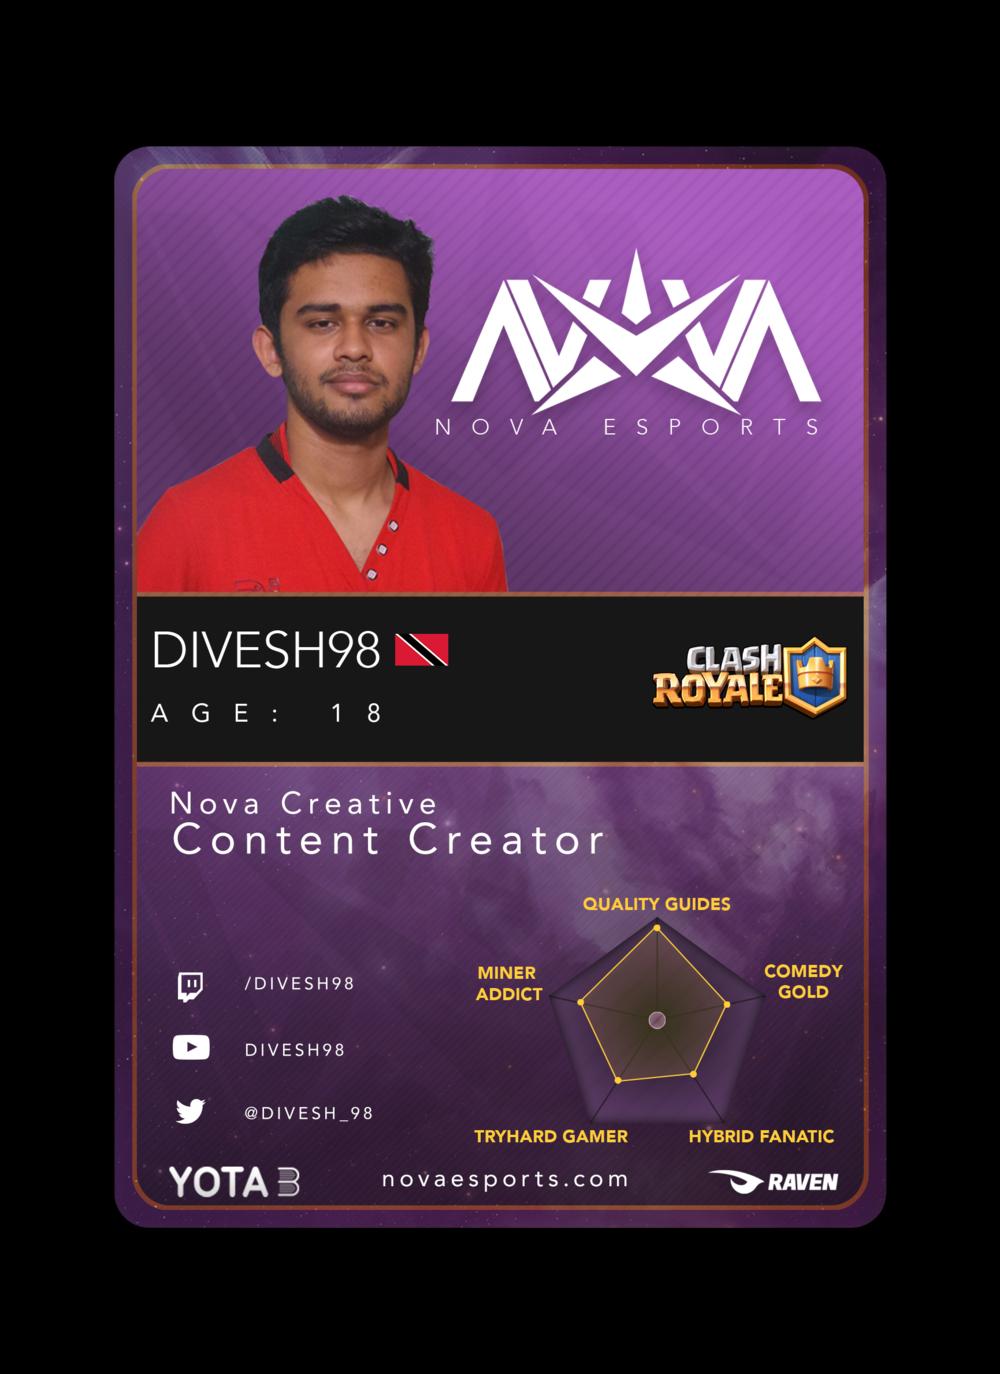 playercard_websitemockup_divesh98playercard_vertical.png